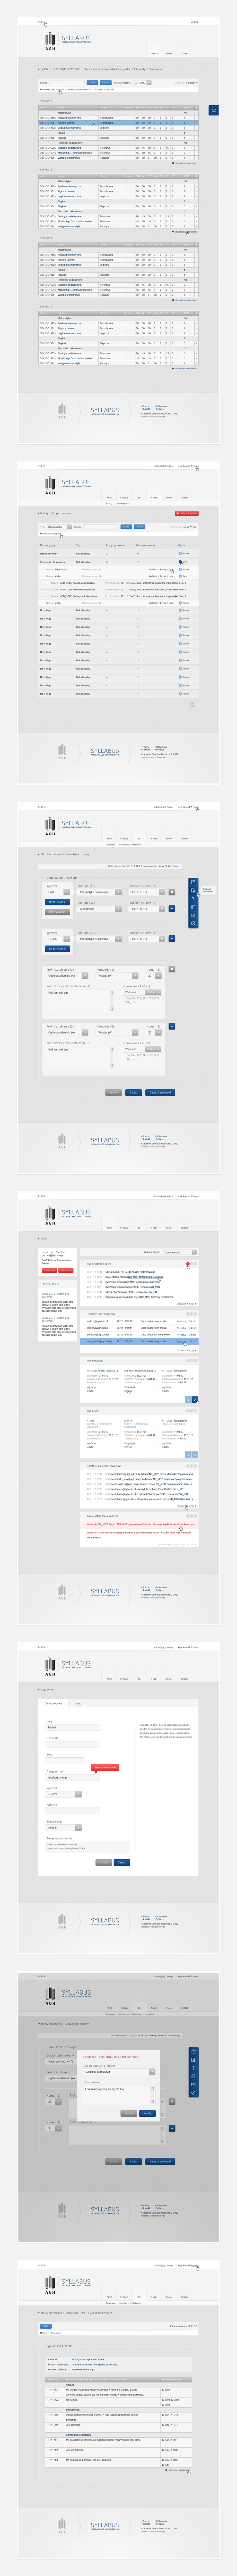 AGH Syllabus interface